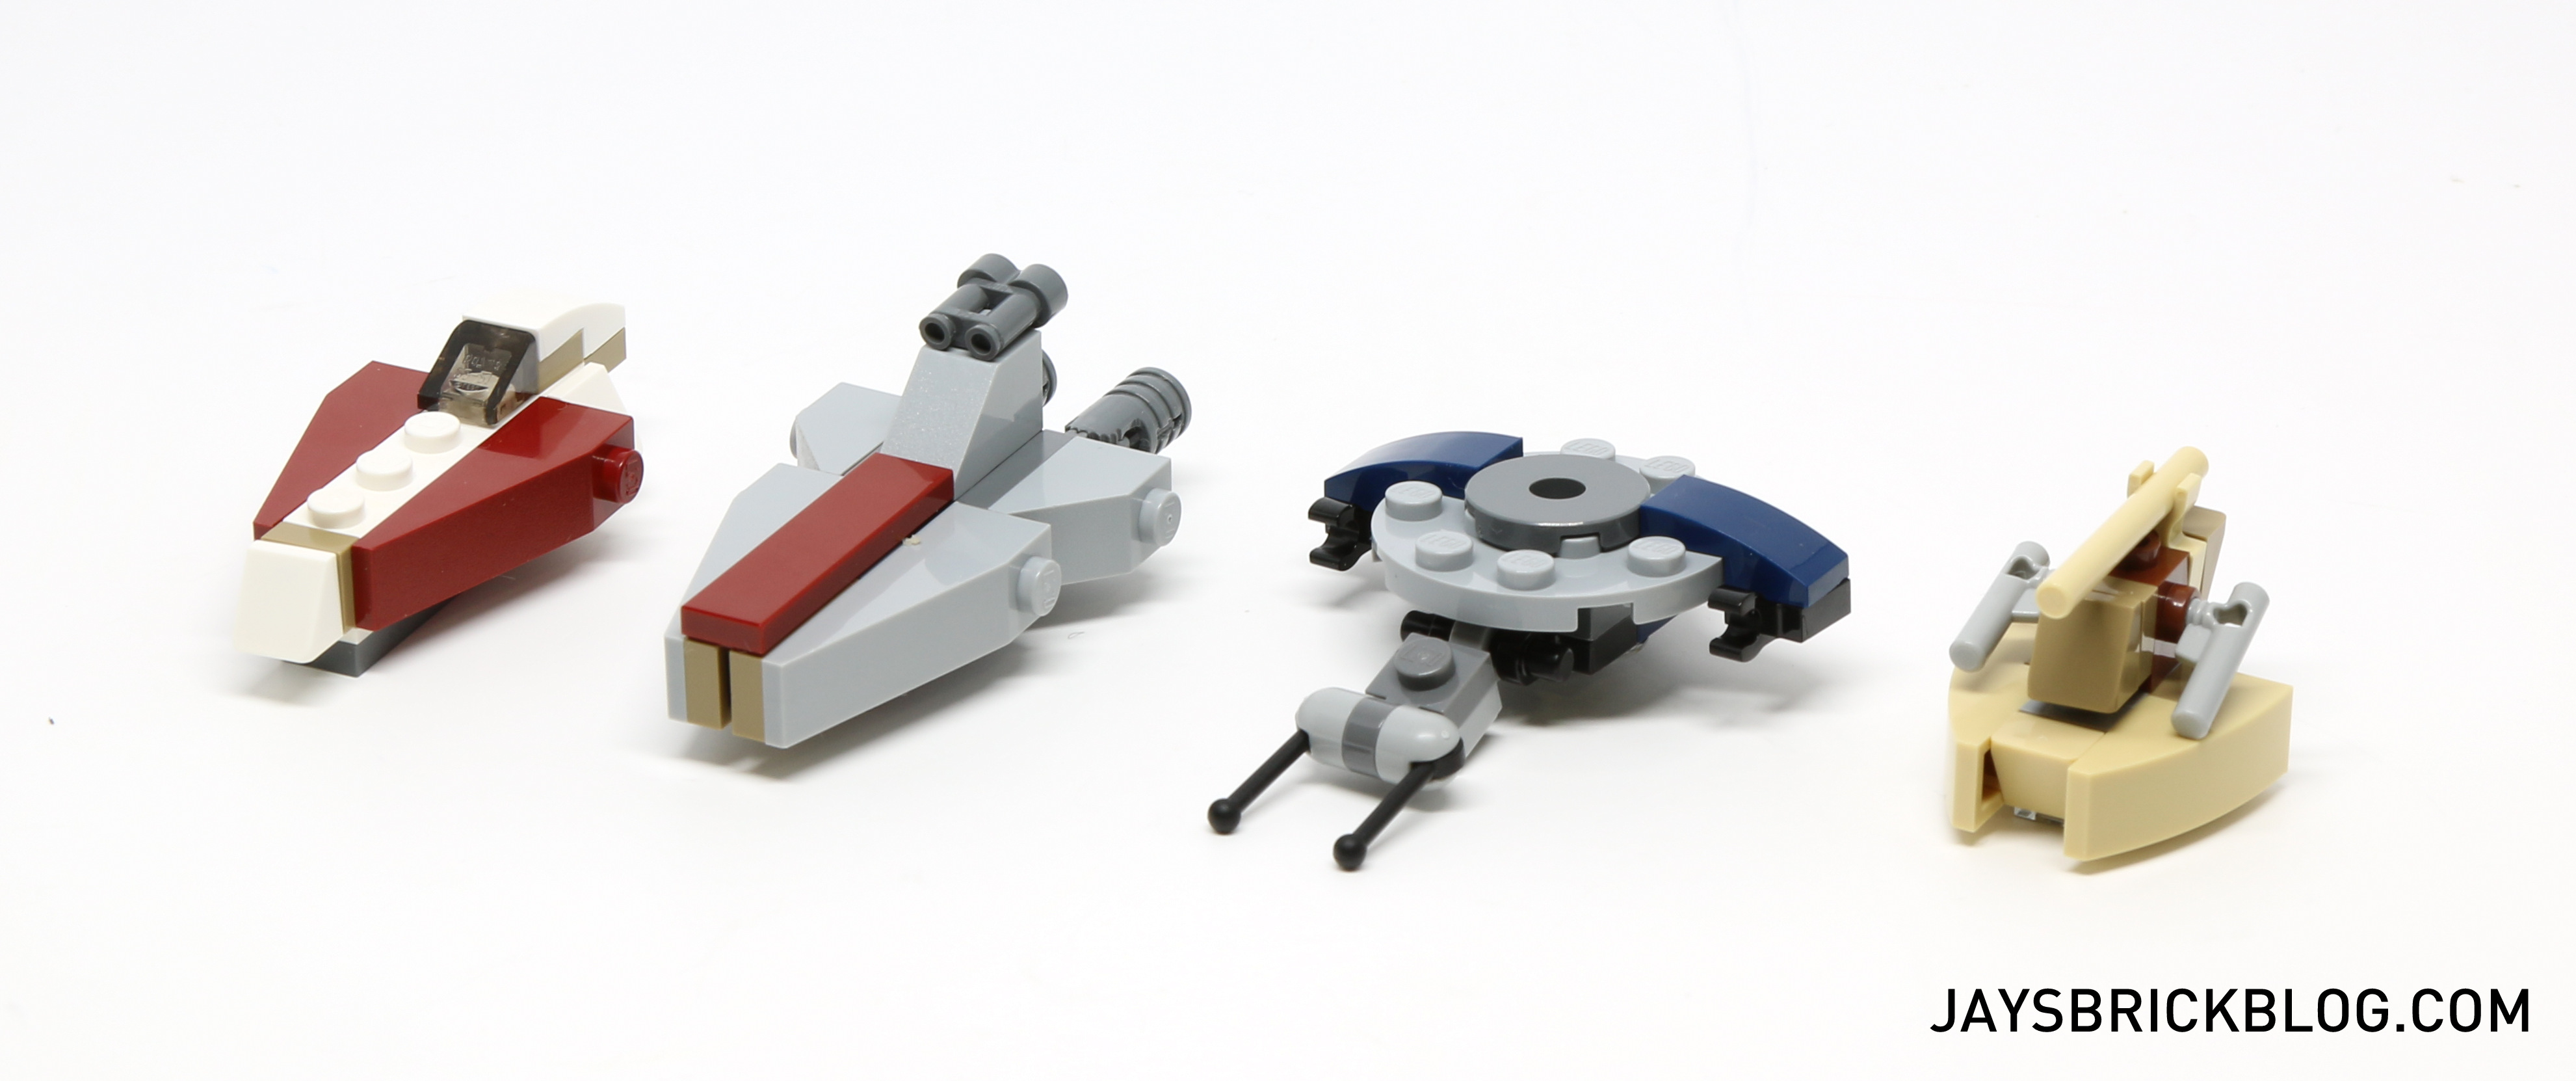 Lego Star Wars Advent Calendar 2016 Jays Brick Blog